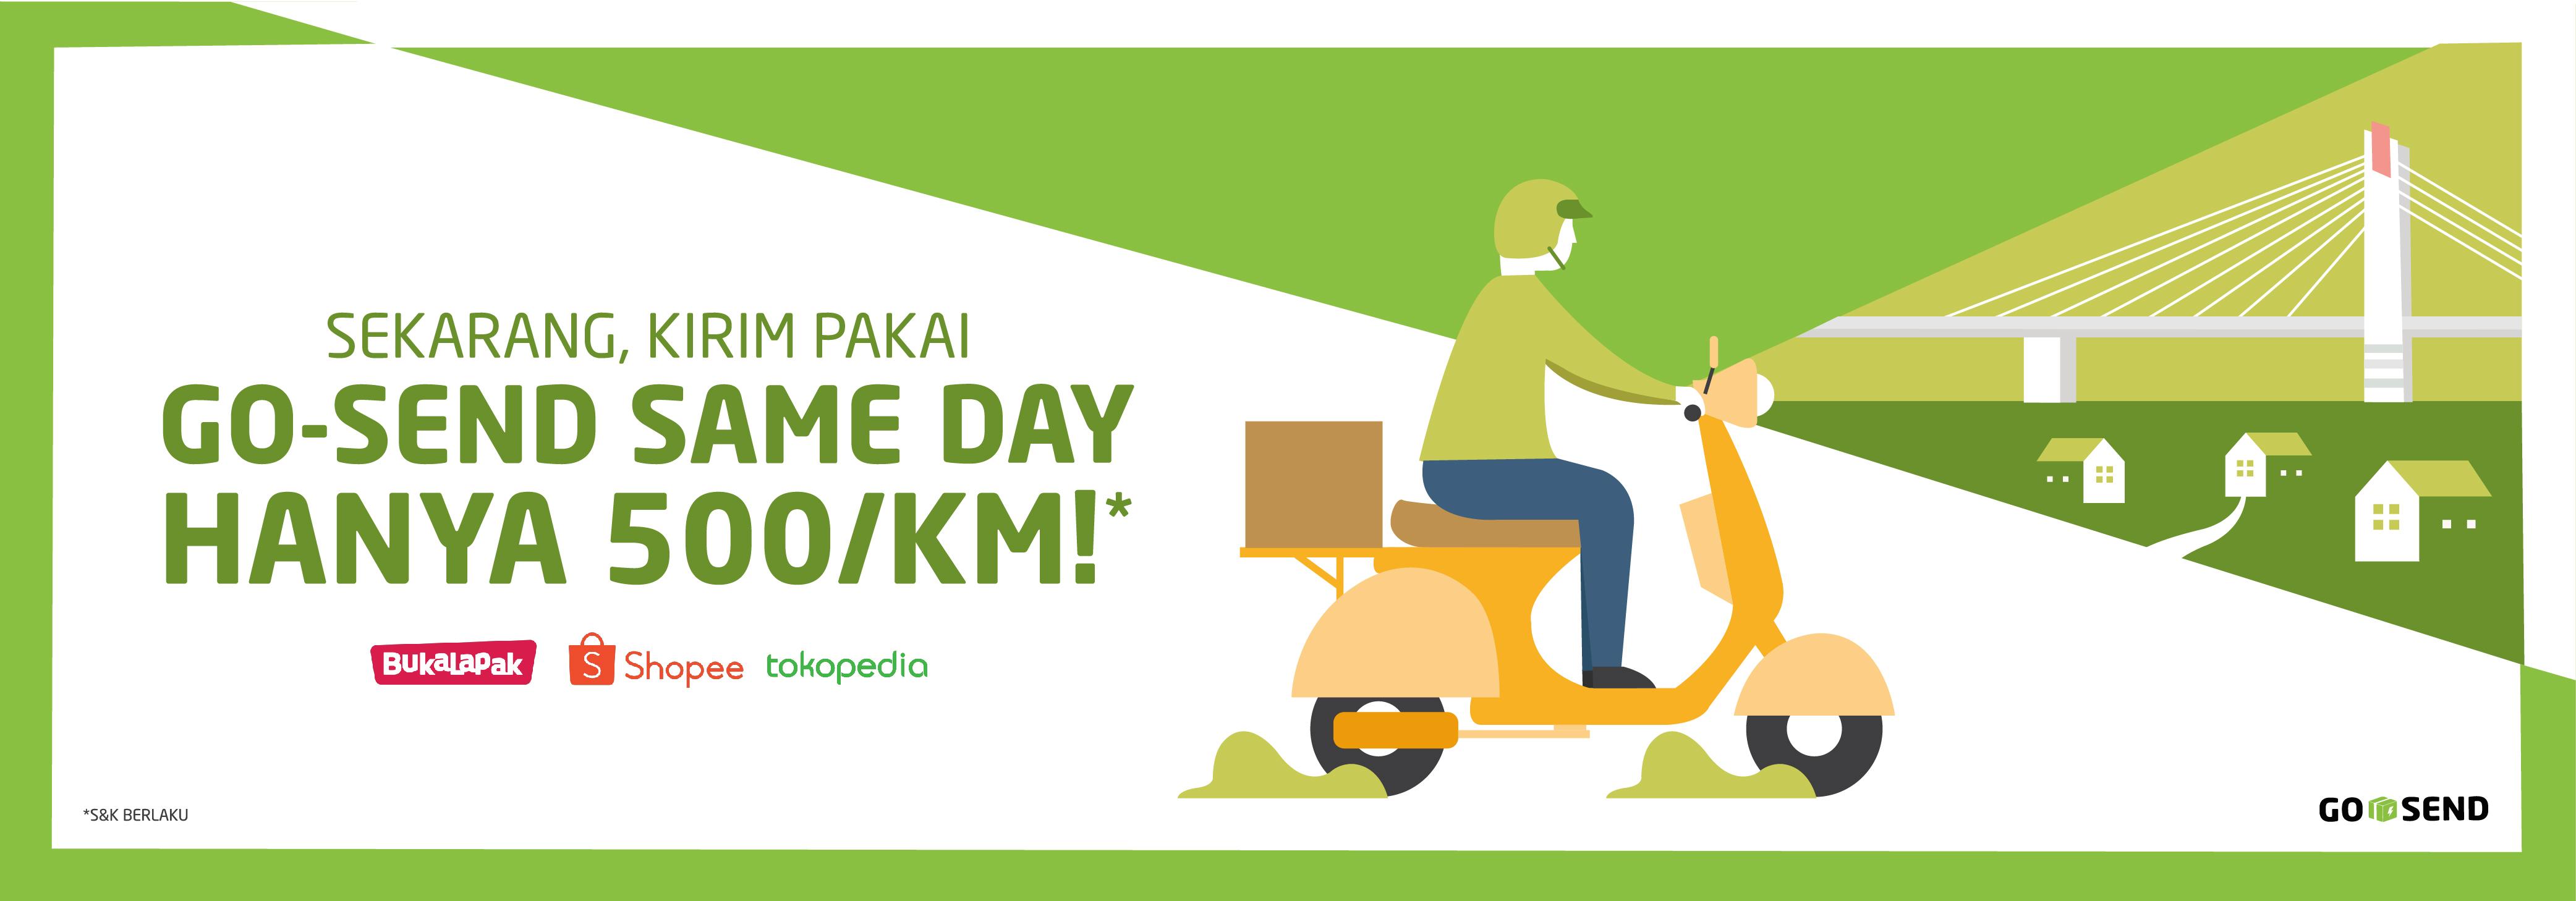 Promo GO-SEND: GO-SEND Same Day Bandung Hanya Rp7.000*